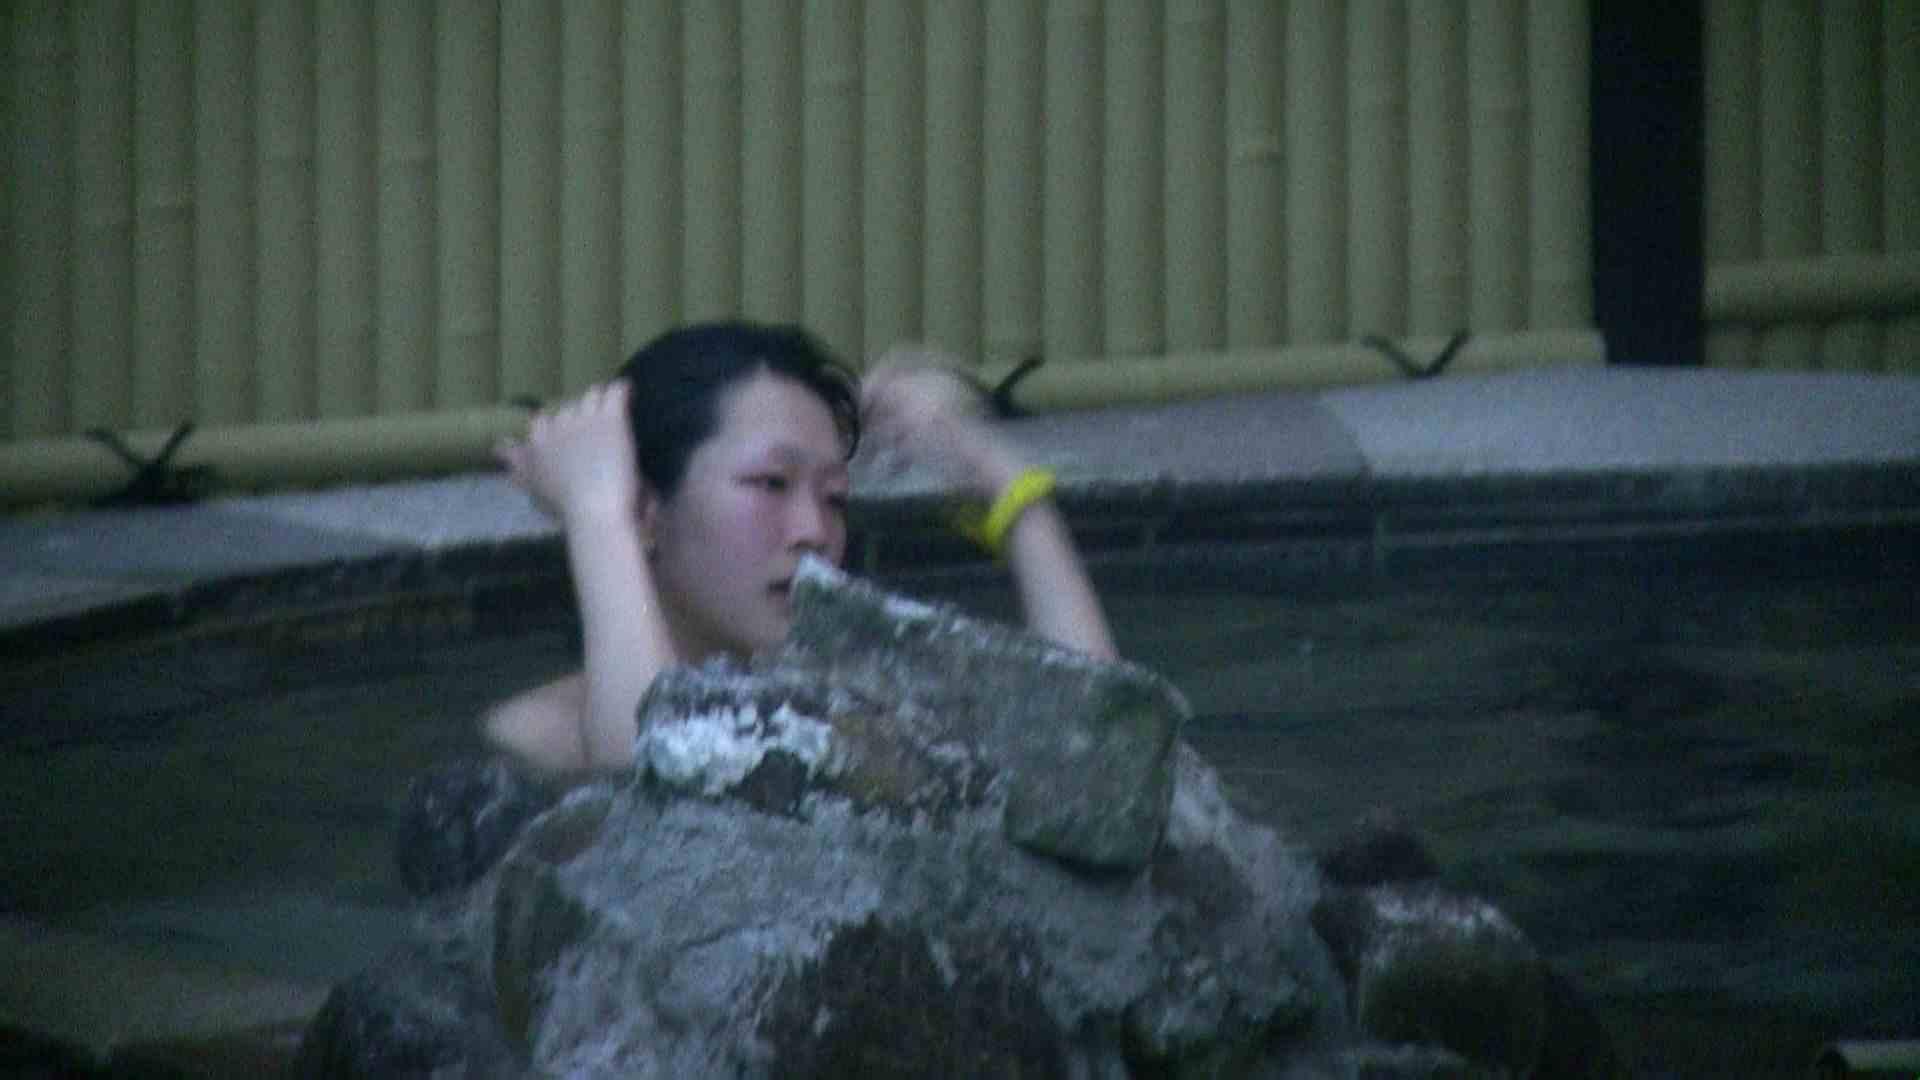 Aquaな露天風呂Vol.05【VIP】 露天風呂編 | 盗撮シリーズ  112PIX 23